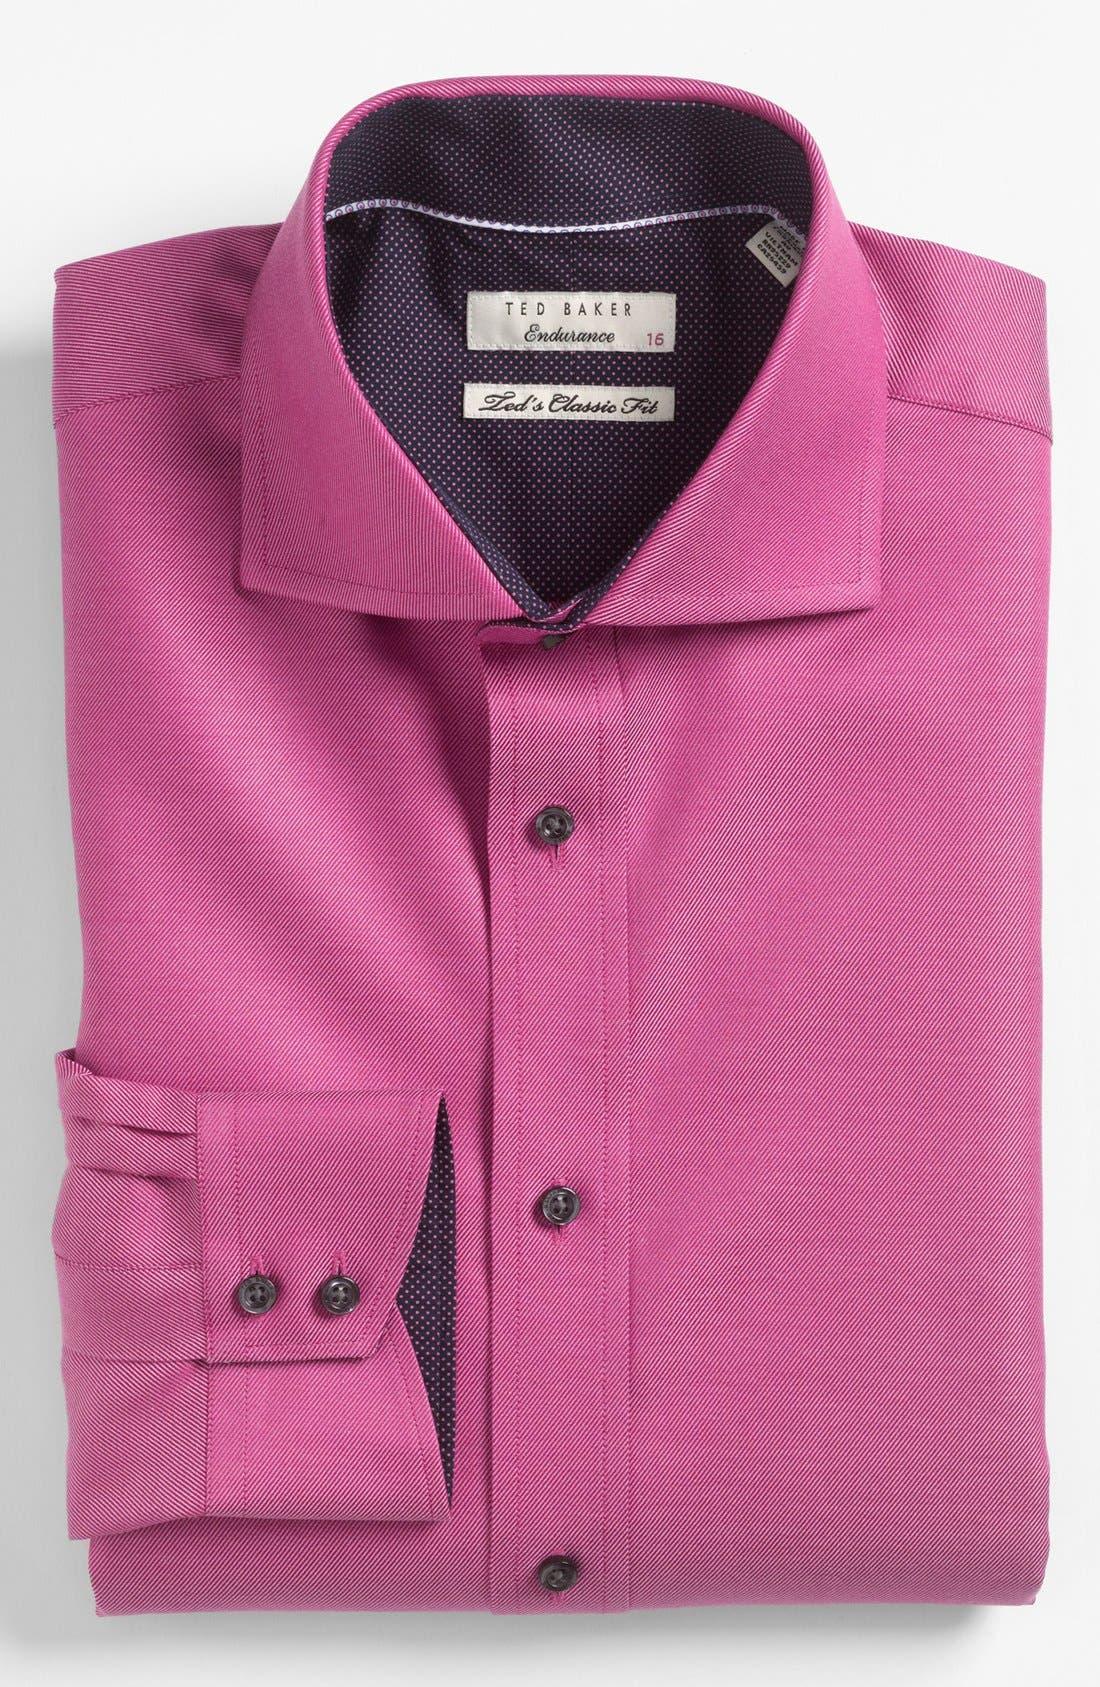 Main Image - Ted Baker London Classic Fit Dress Shirt